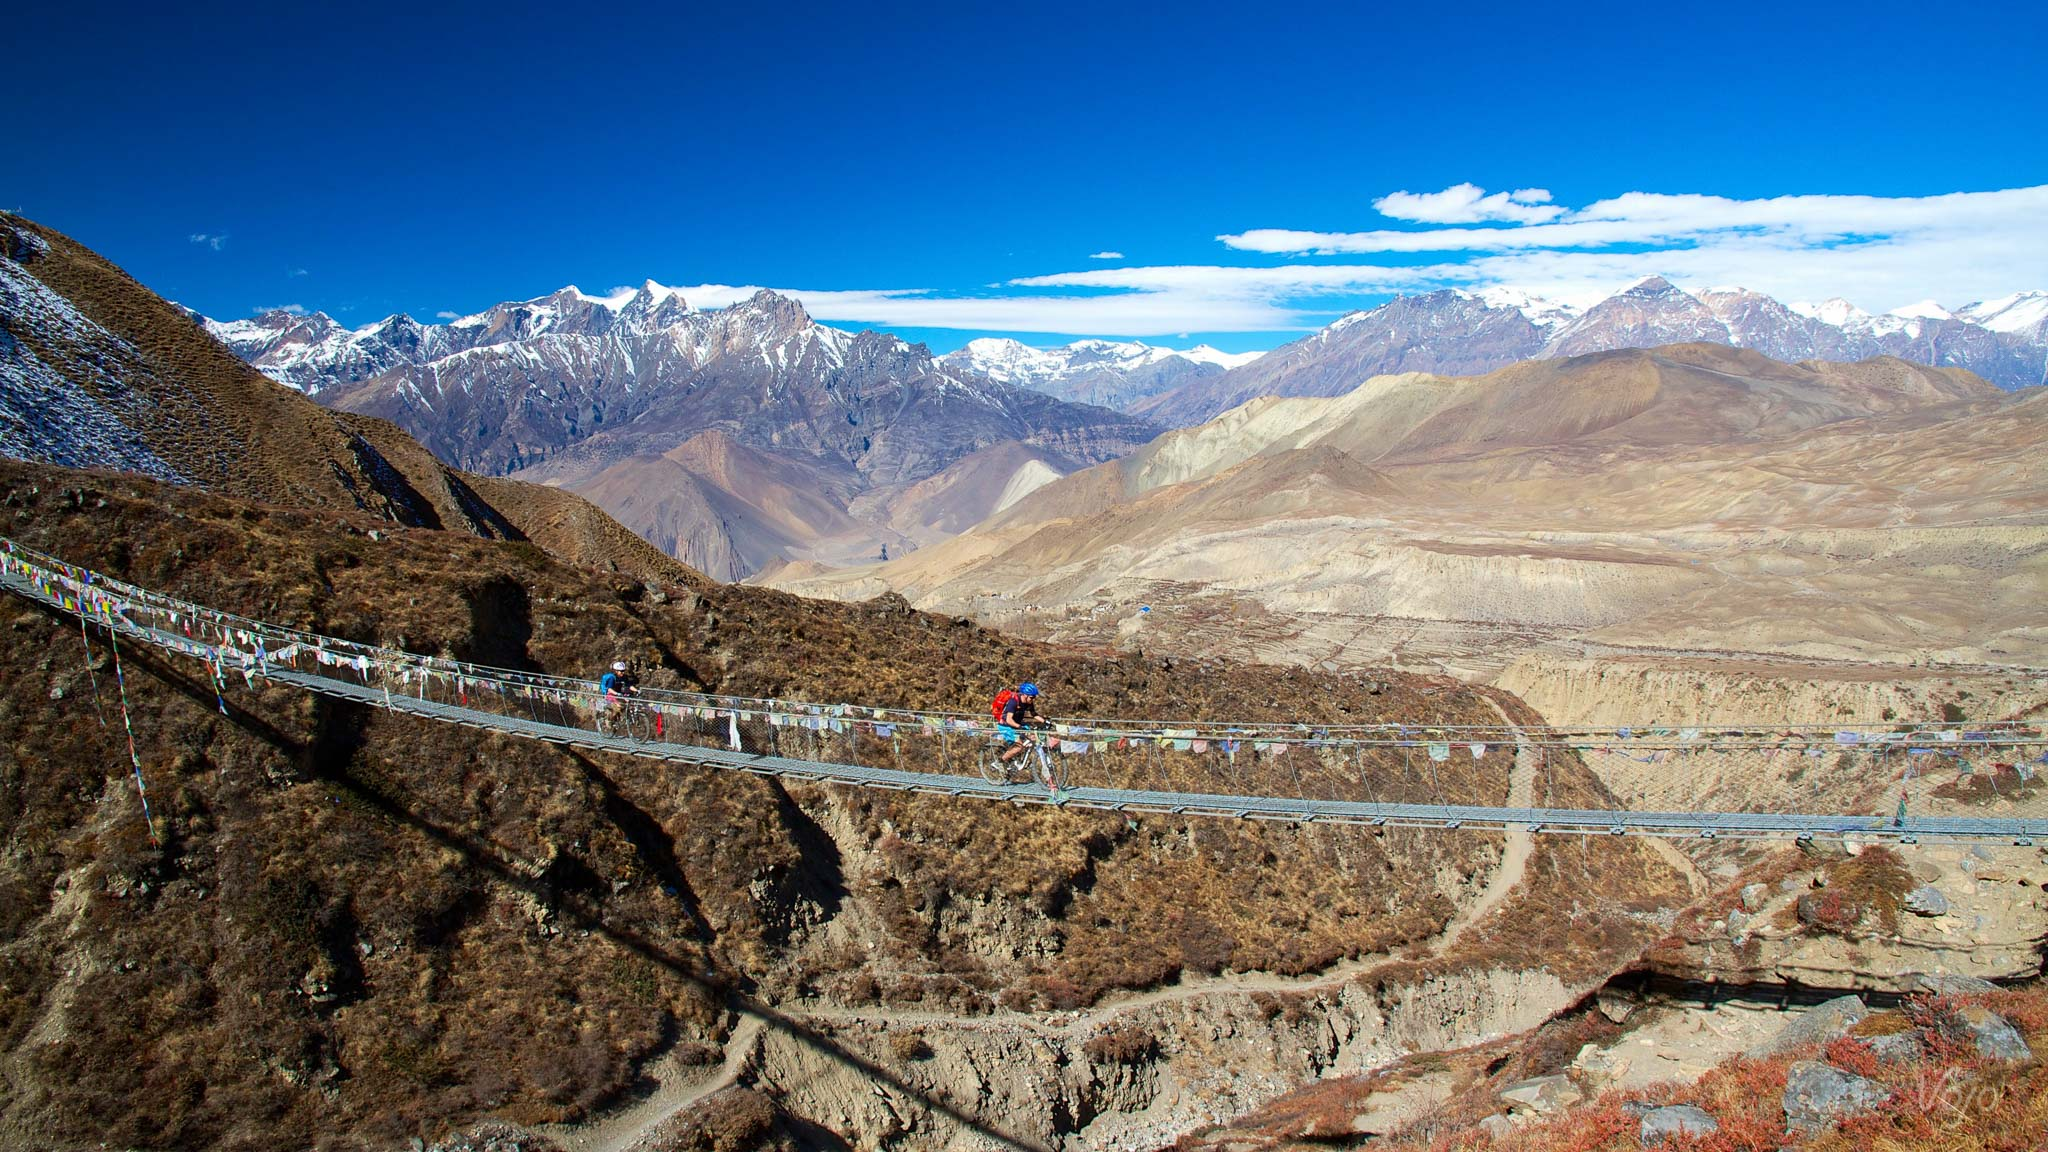 Nepal_Copyright_Molinero_VojoMag-6